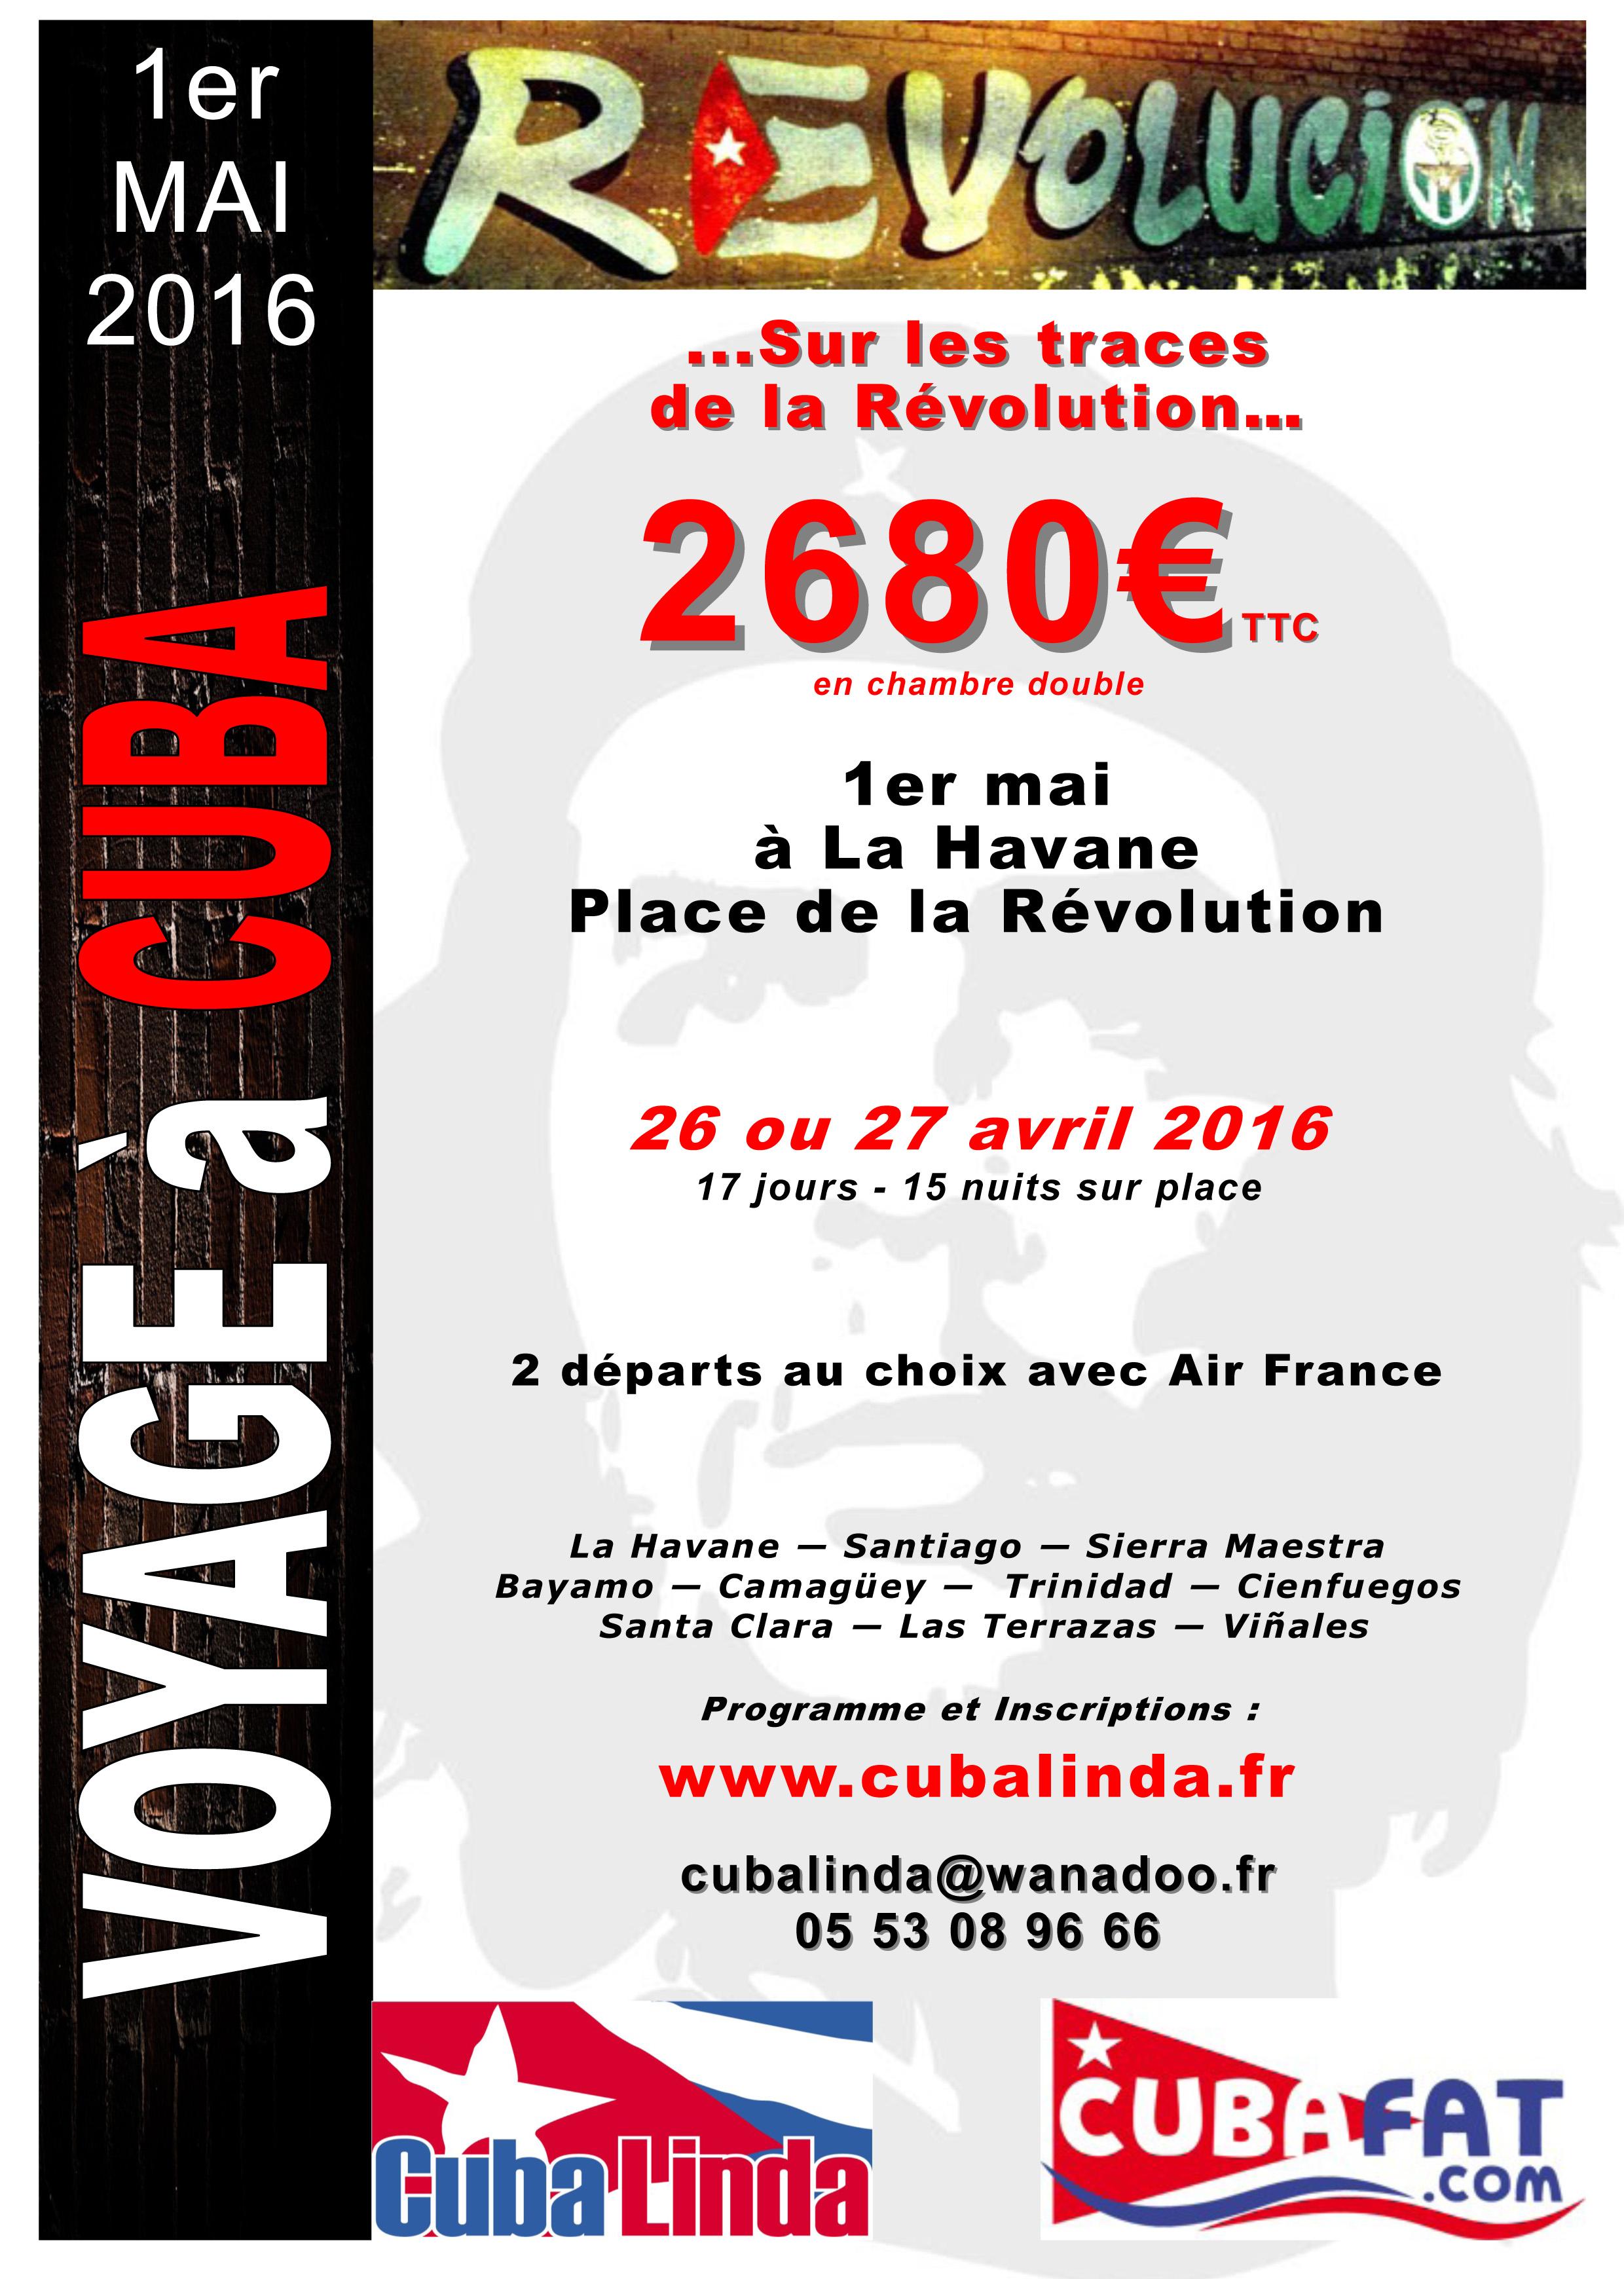 Voyage Révolution